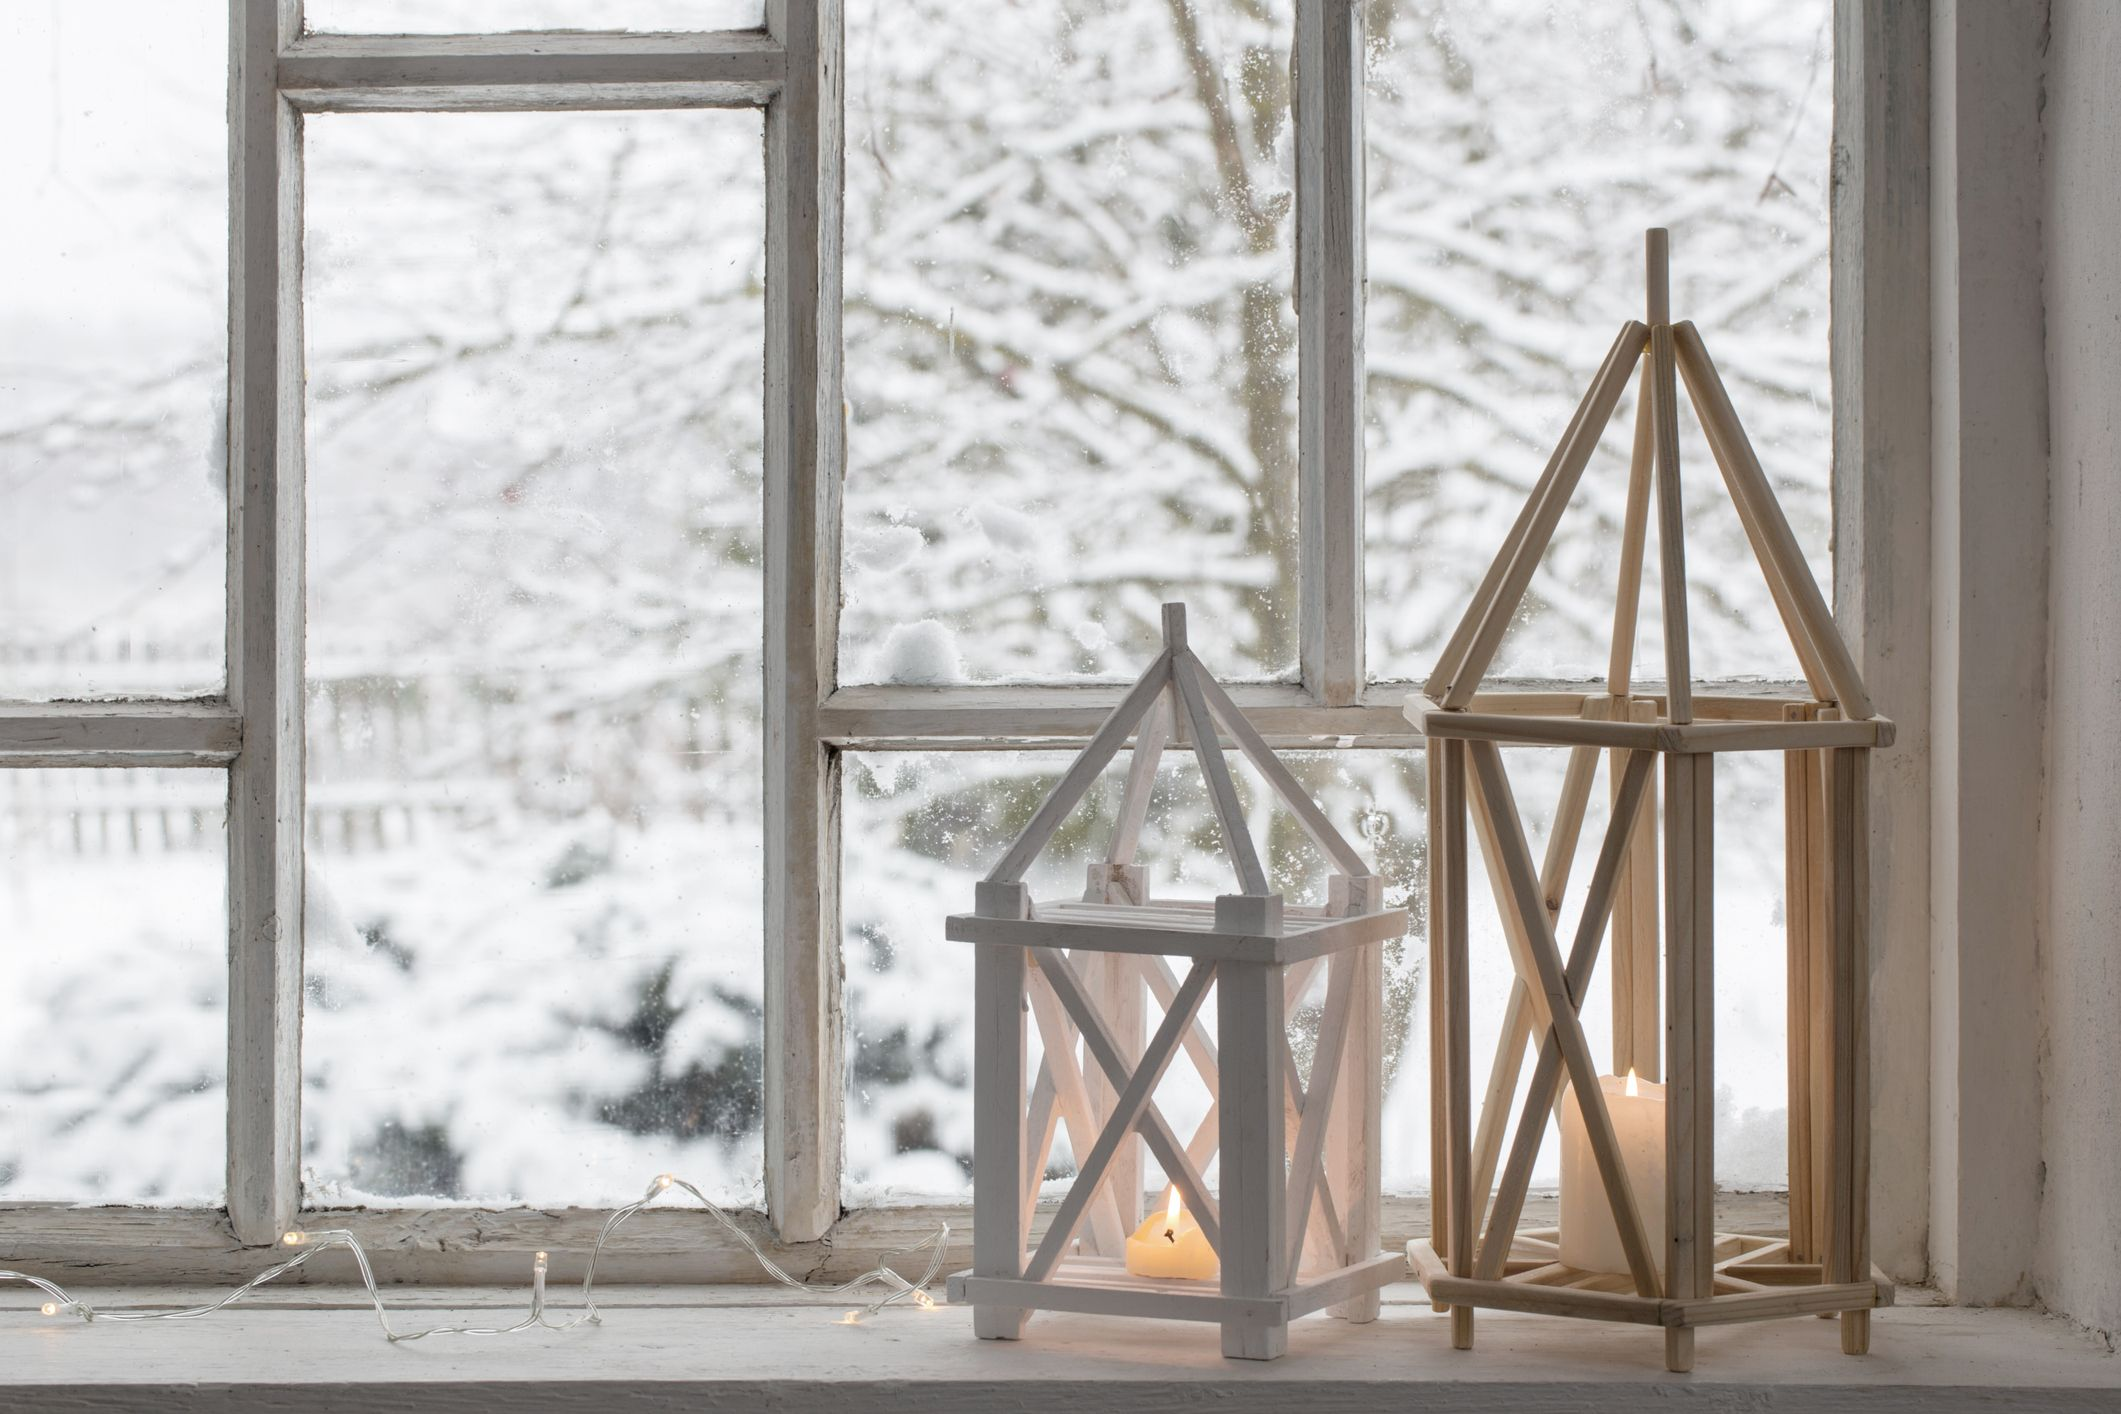 22 Creative Window Sill Decor Ideas How To Decorate A Window Sill